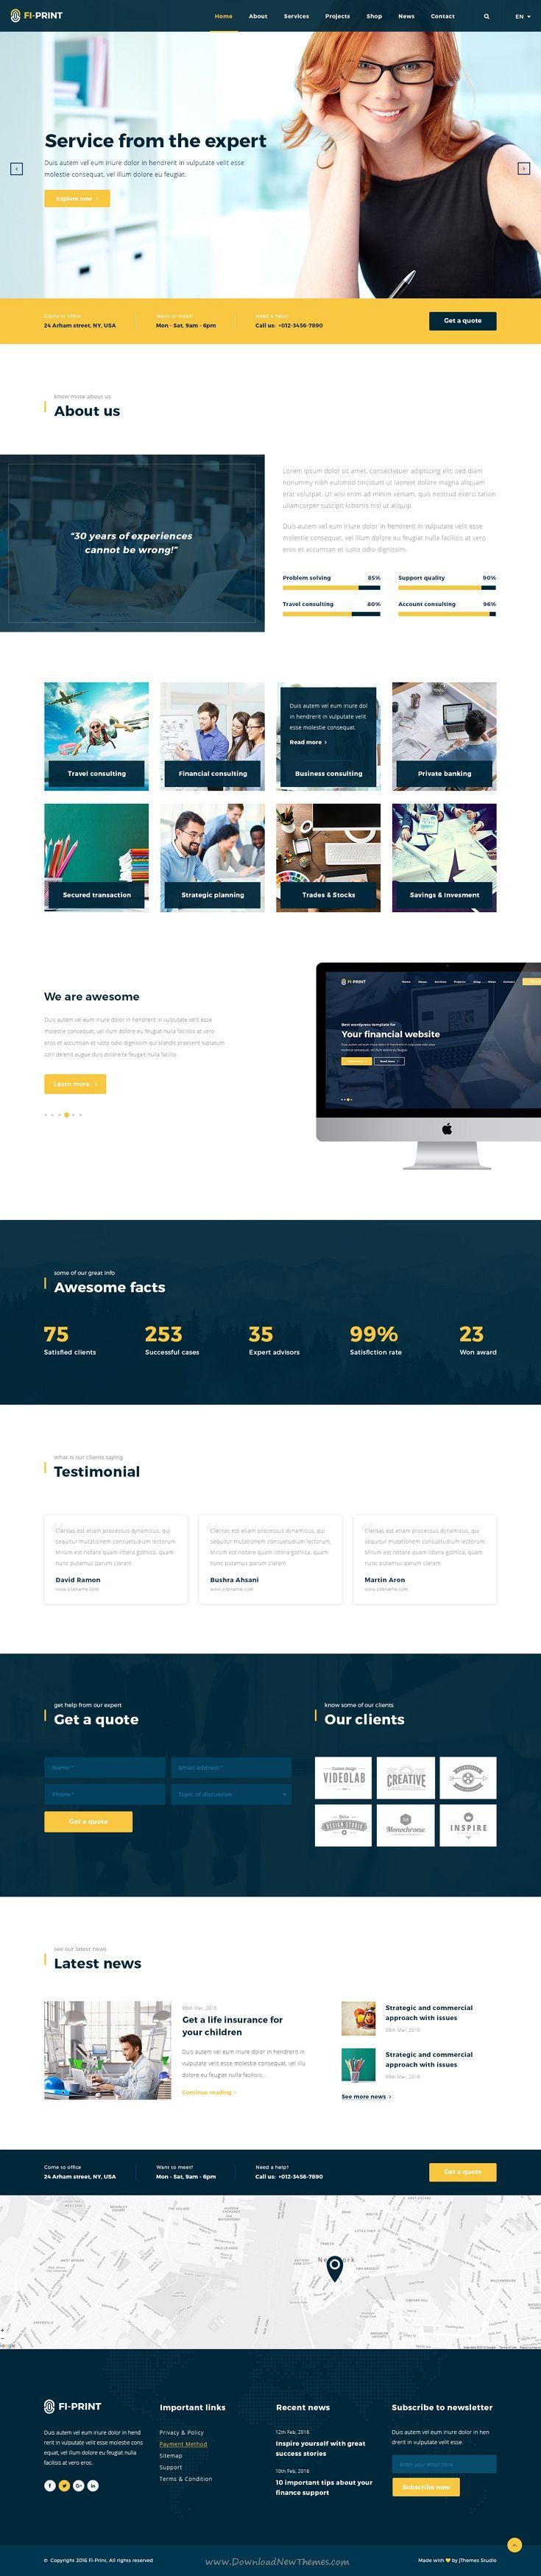 Best 25+ Corporate website templates ideas on Pinterest